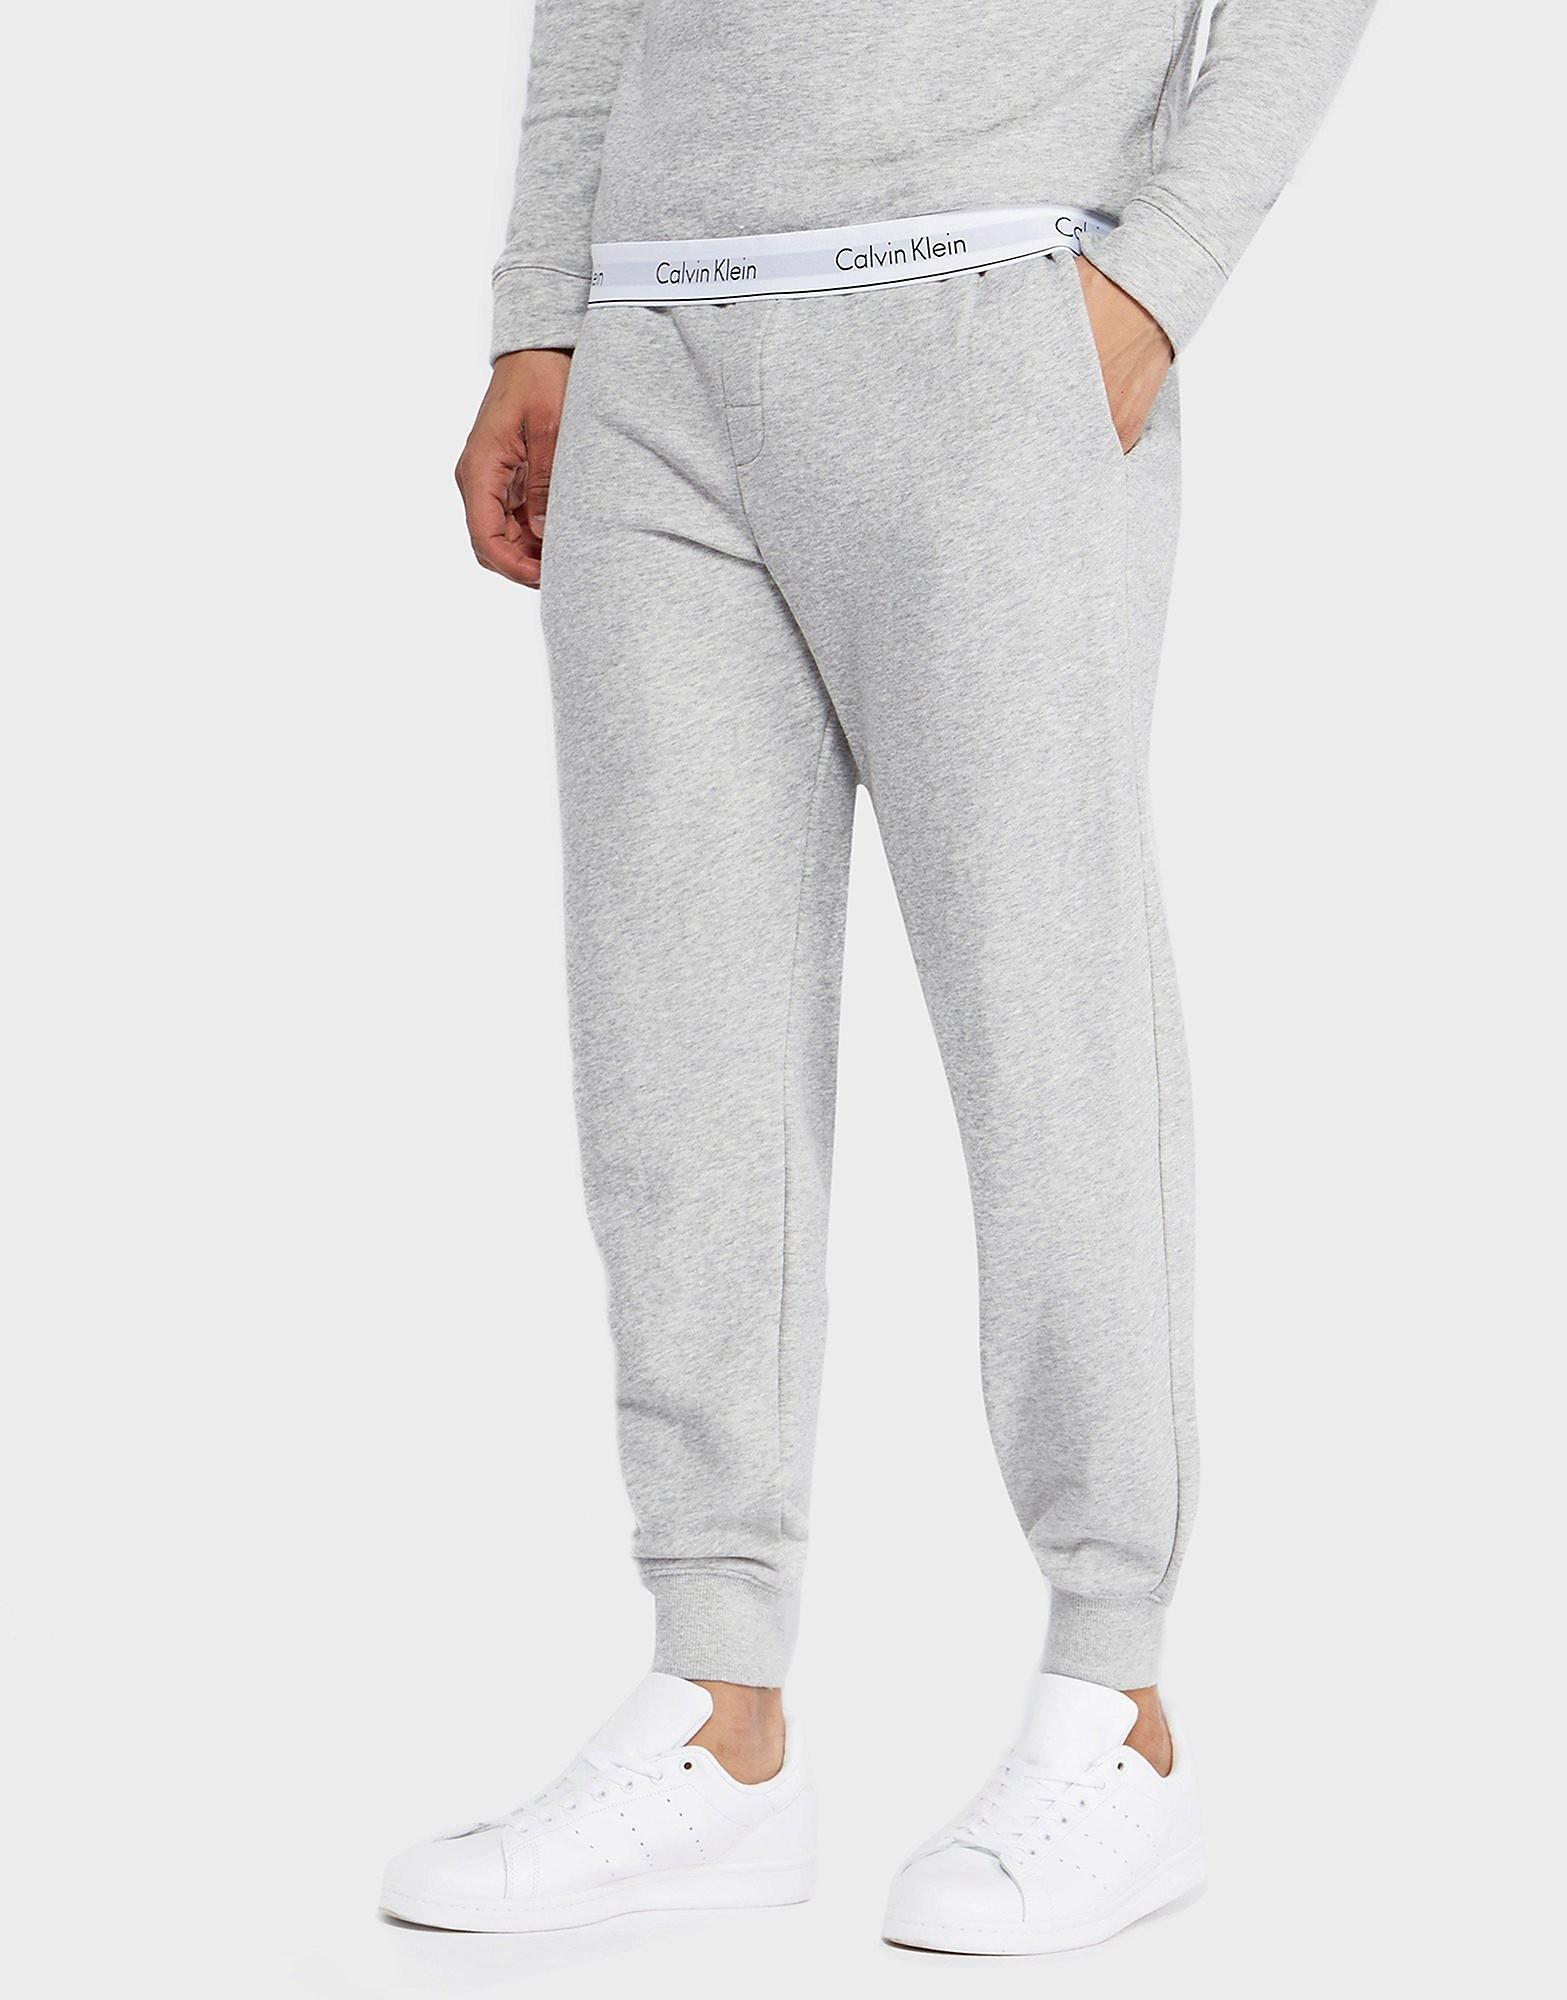 Calvin Klein Tape Track Pants